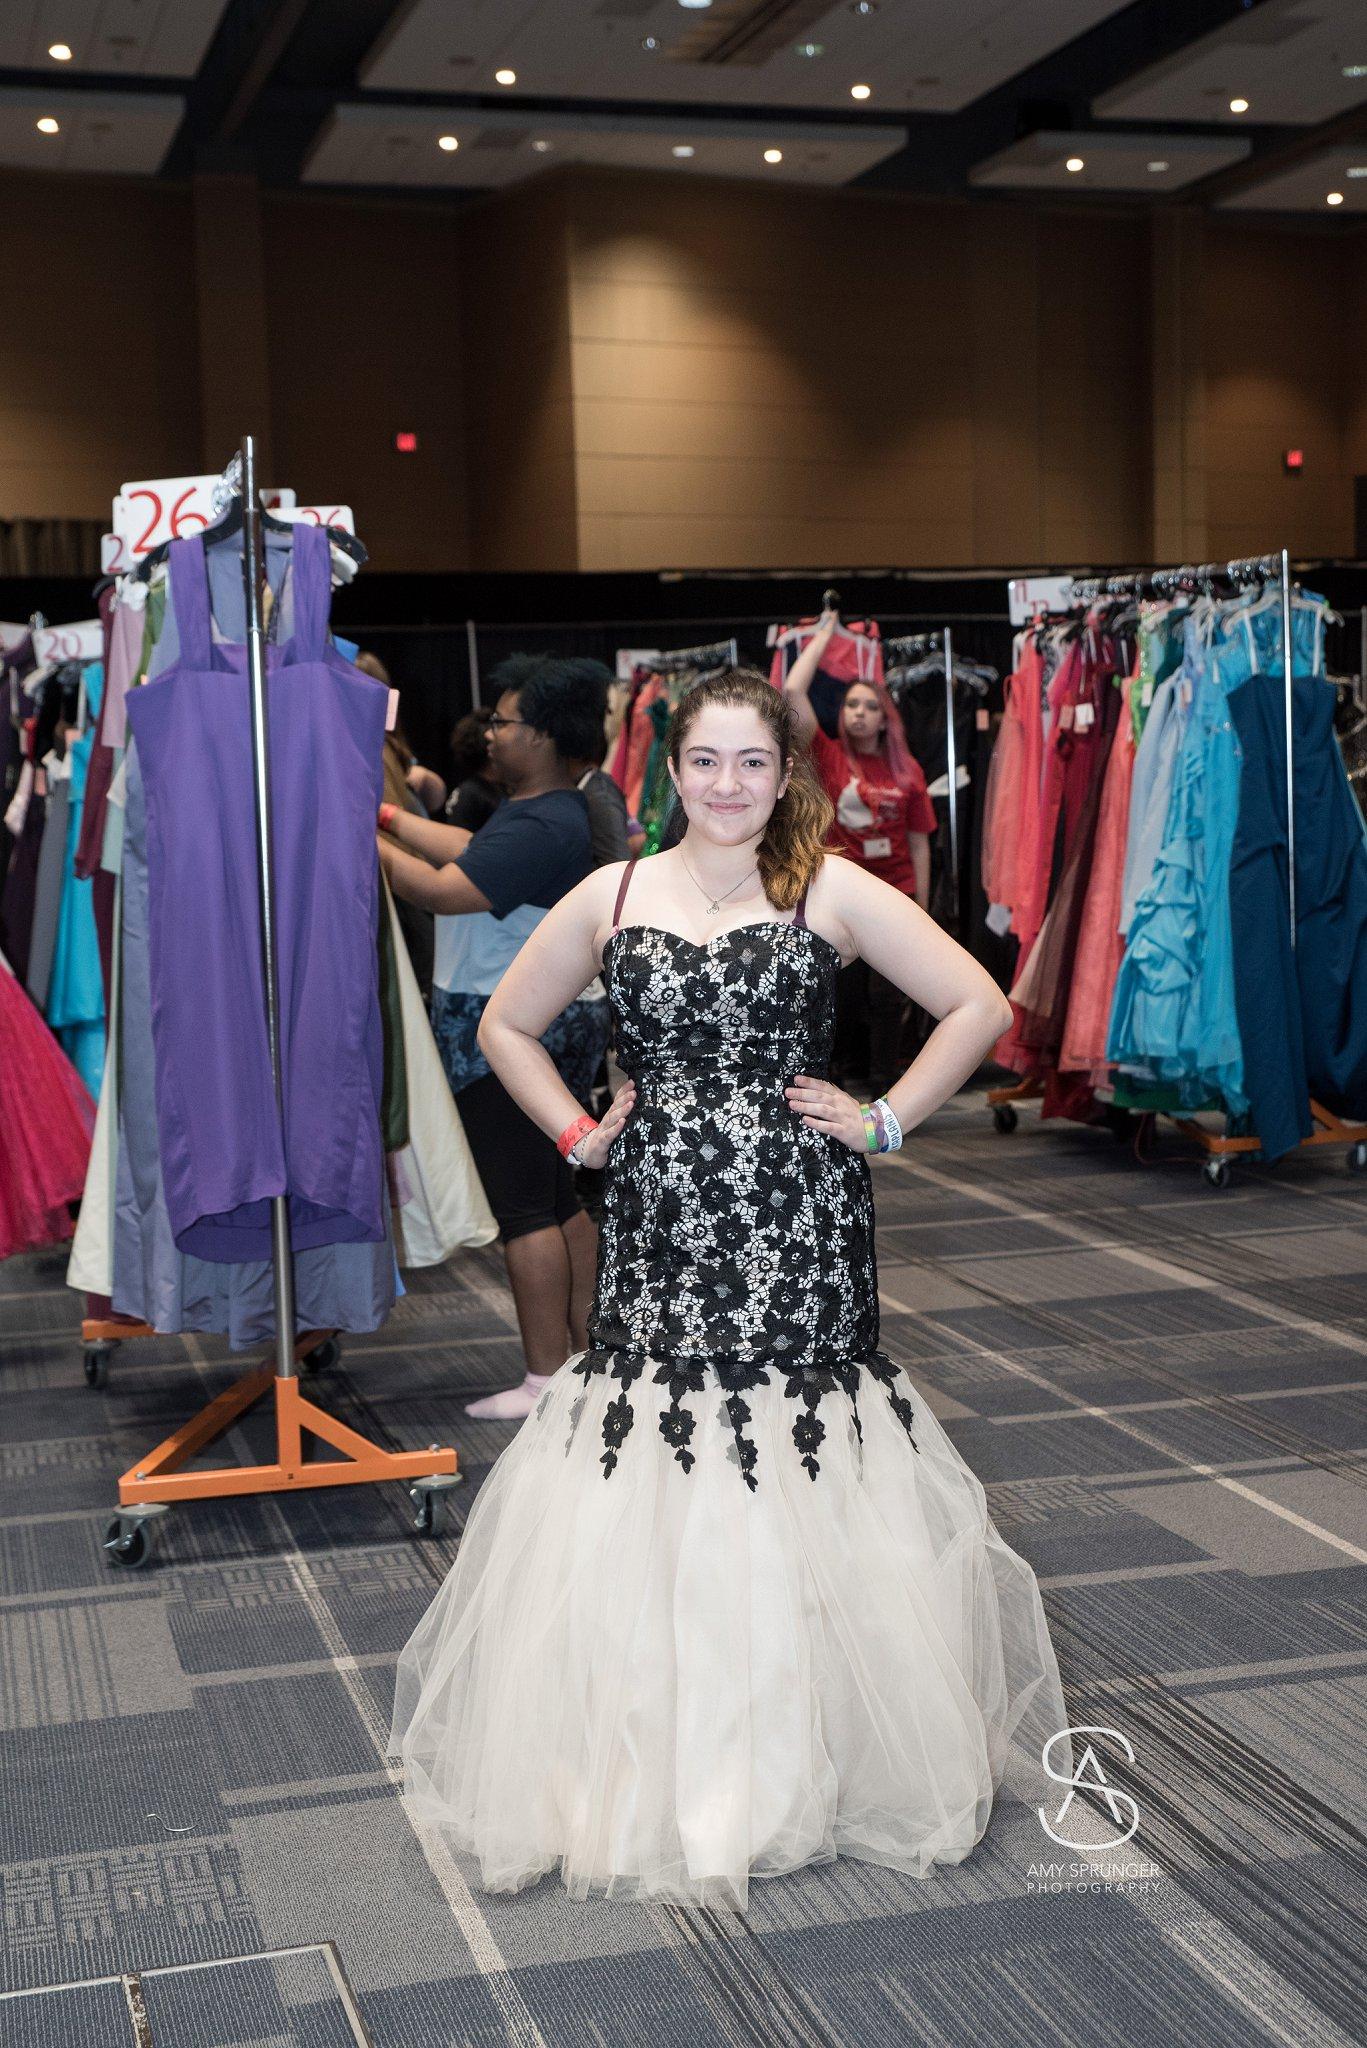 Perfect Dress Found!